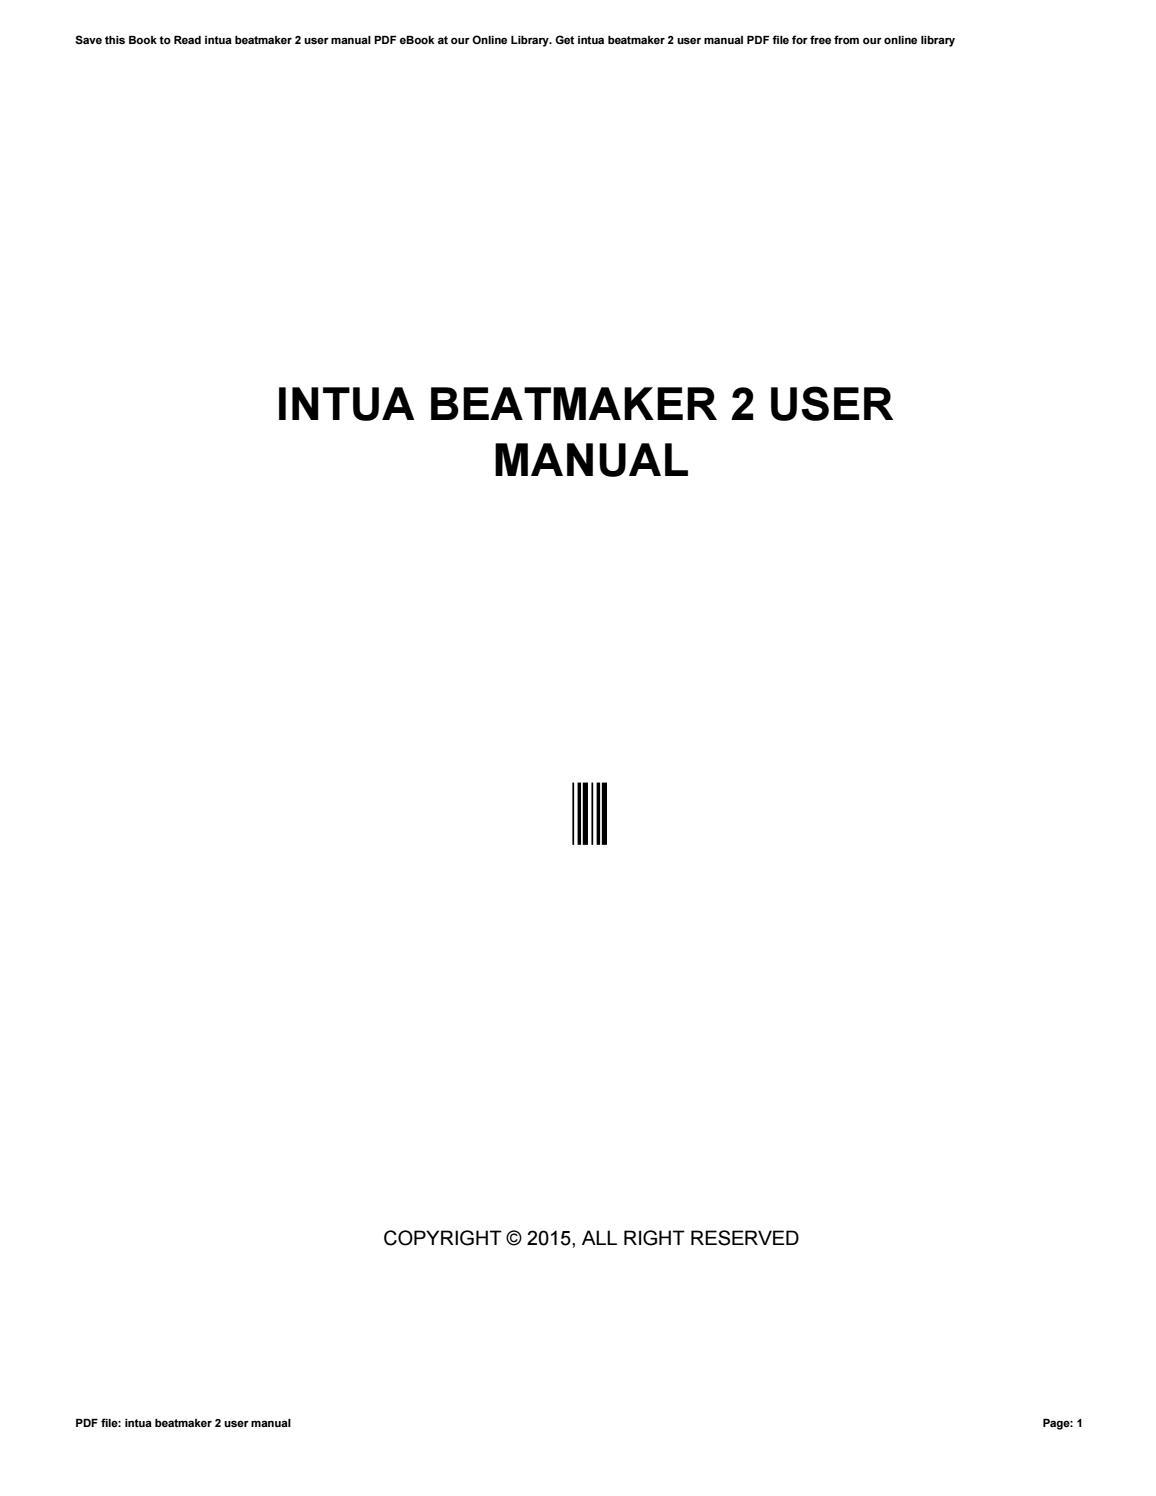 Beatmaker 2 tutorial.